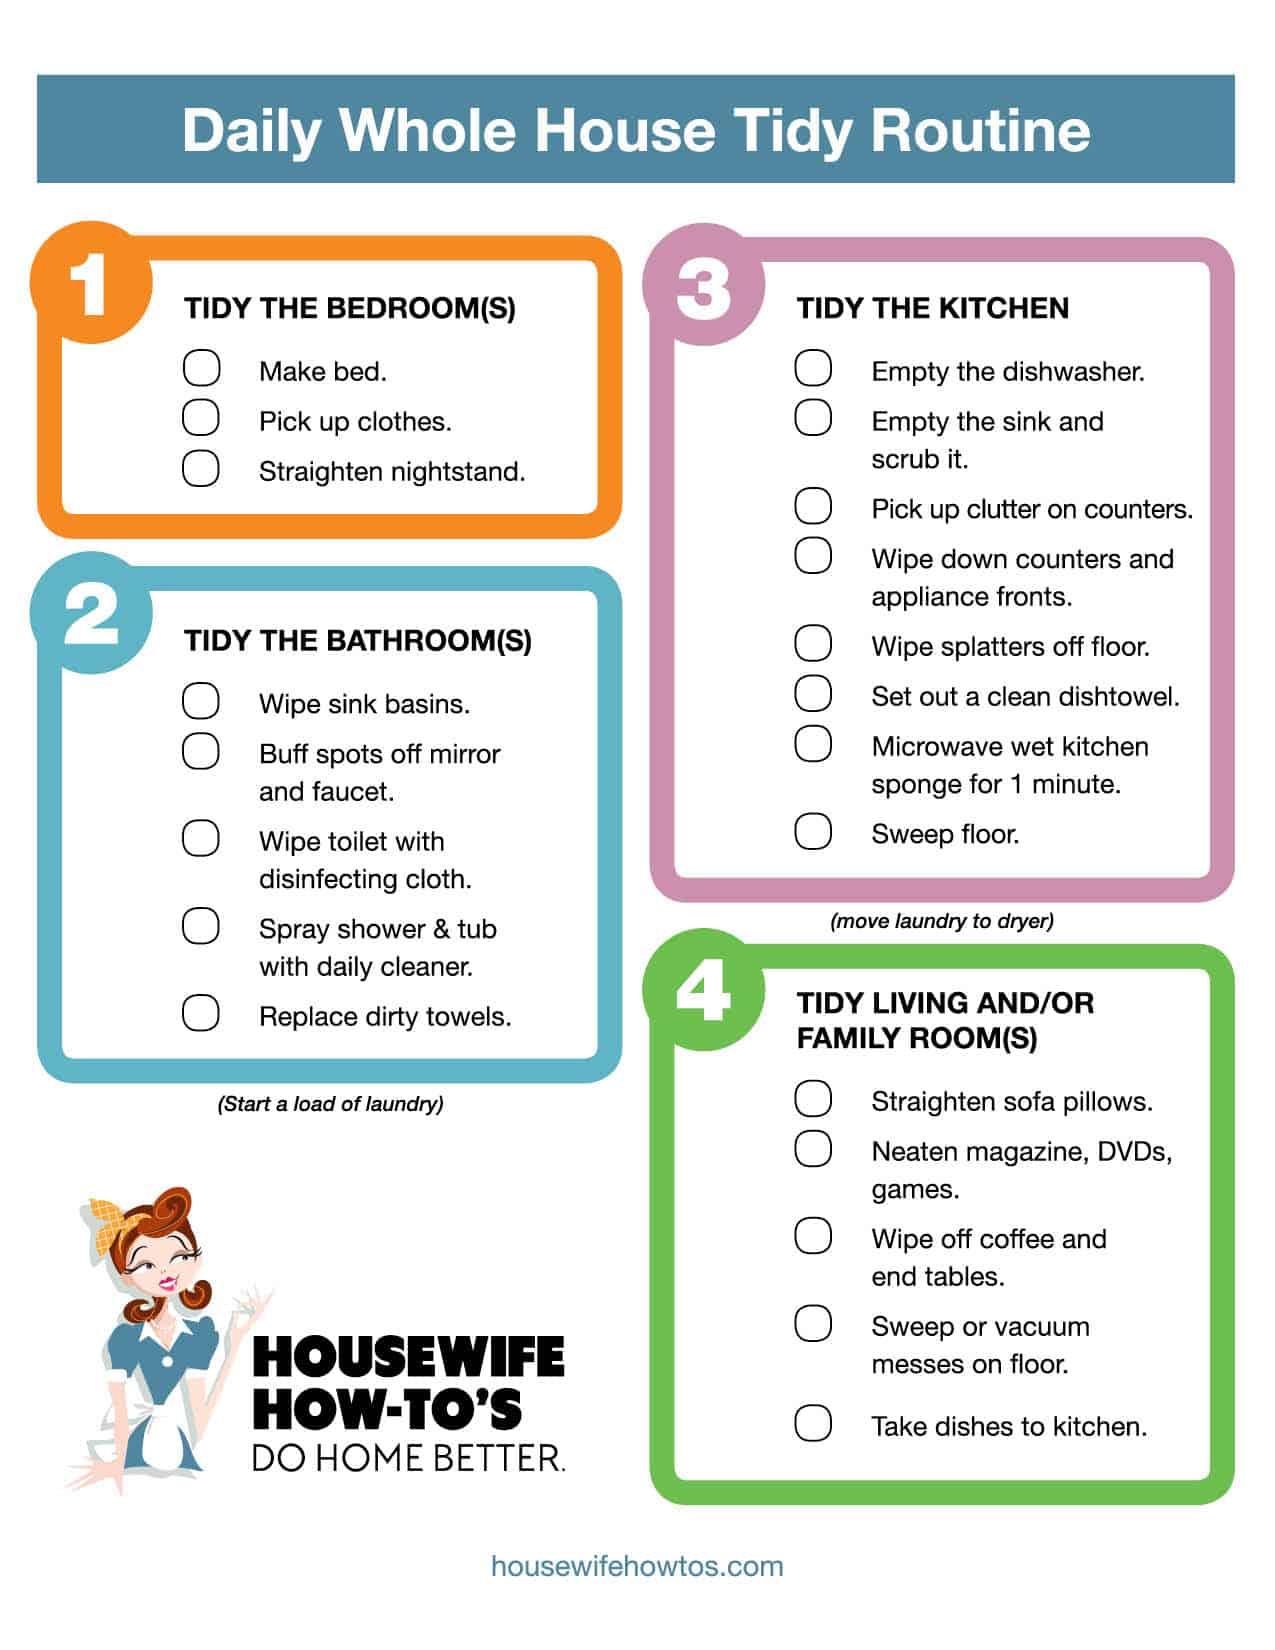 Lista de verificación imprimible de rutina de limpieza diaria